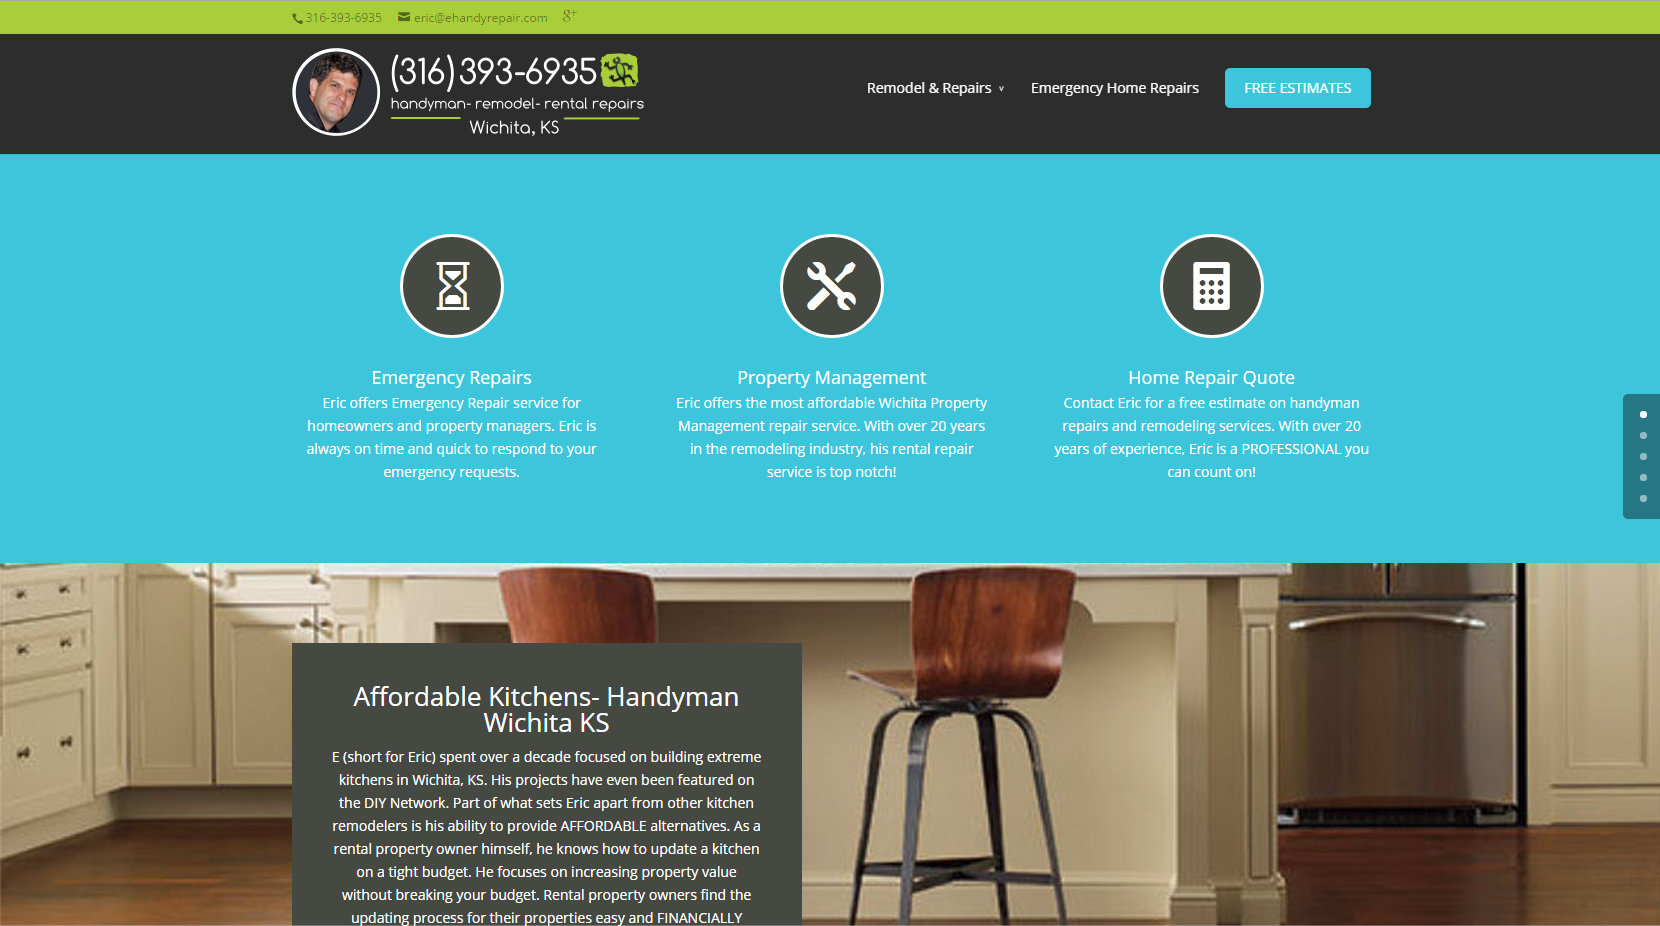 Handyman Wichita KS Website Design